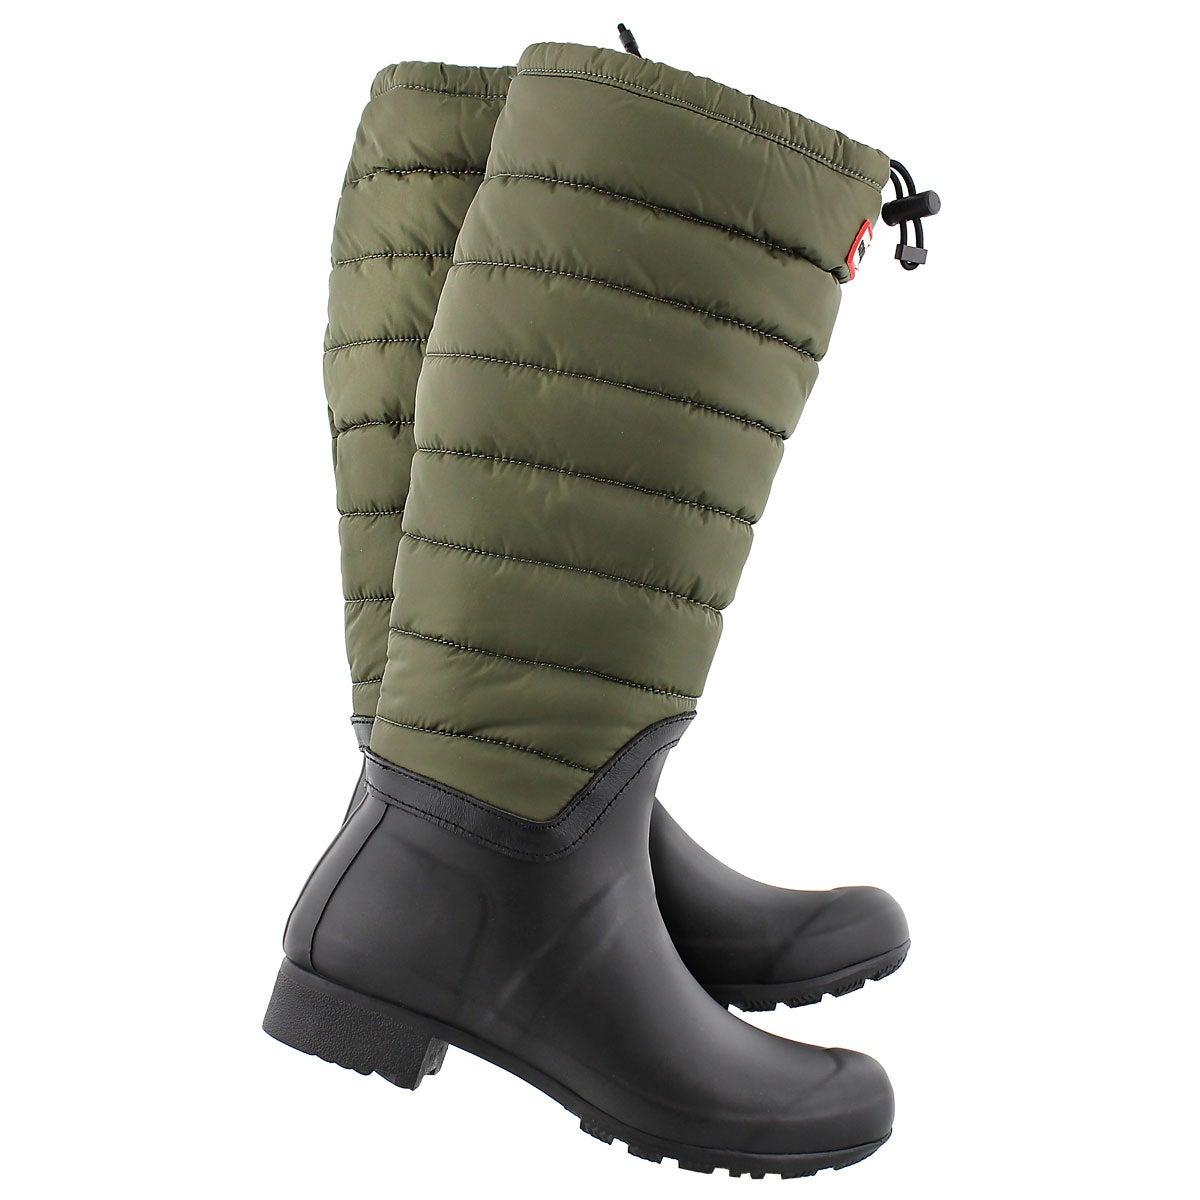 Lds Original Quilted Leg swamp rain boot